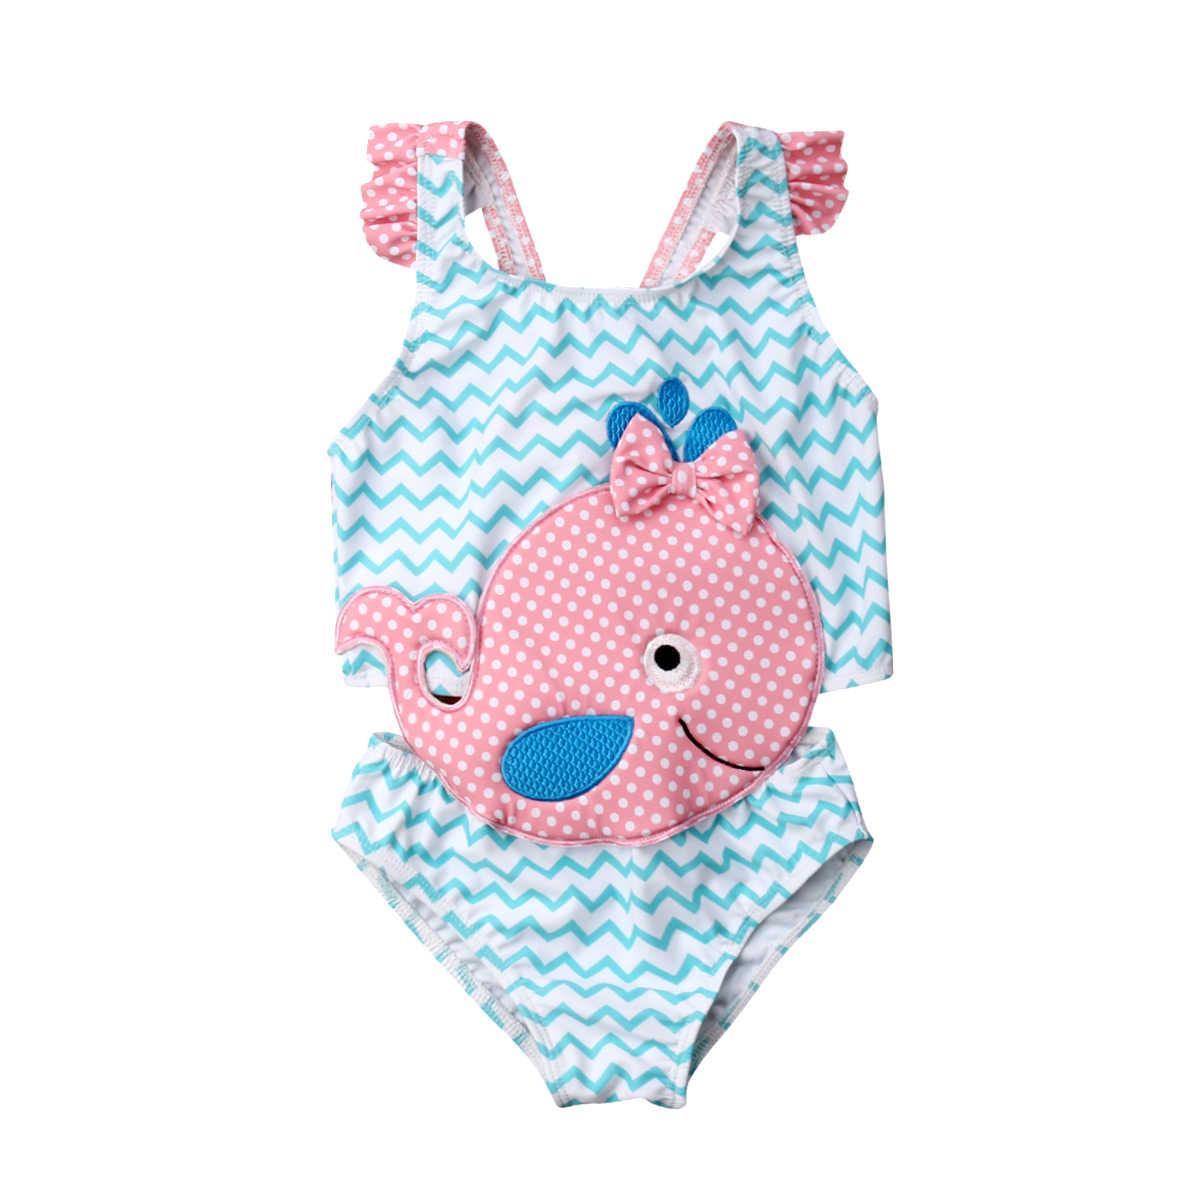 8414f78345e3 2019 Canis Summer Baby Girls Goldfish Swimwear Swimsuit Beachwear Bathing  Suit One Piece